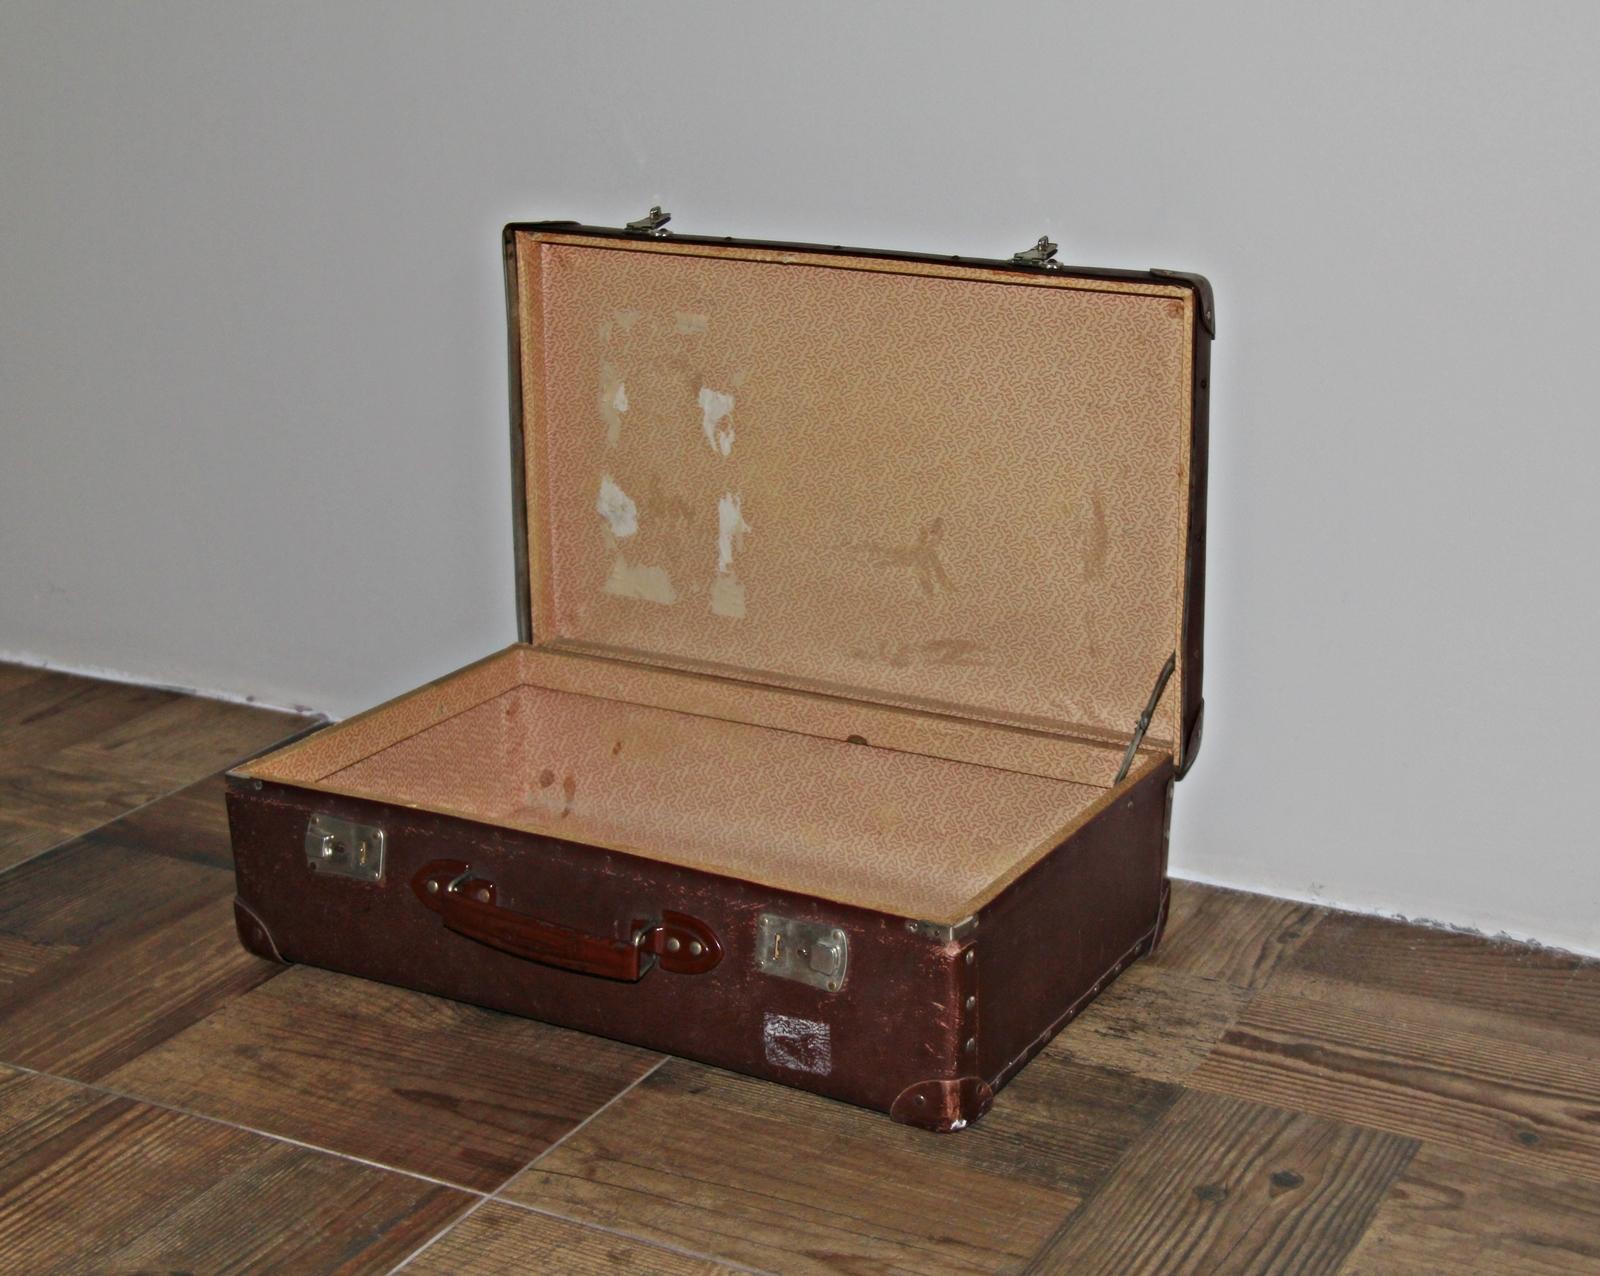 ee722fd2a1930 Hokus Pokus Home: Jak przerobić walizkę na designerski stolik vintage?